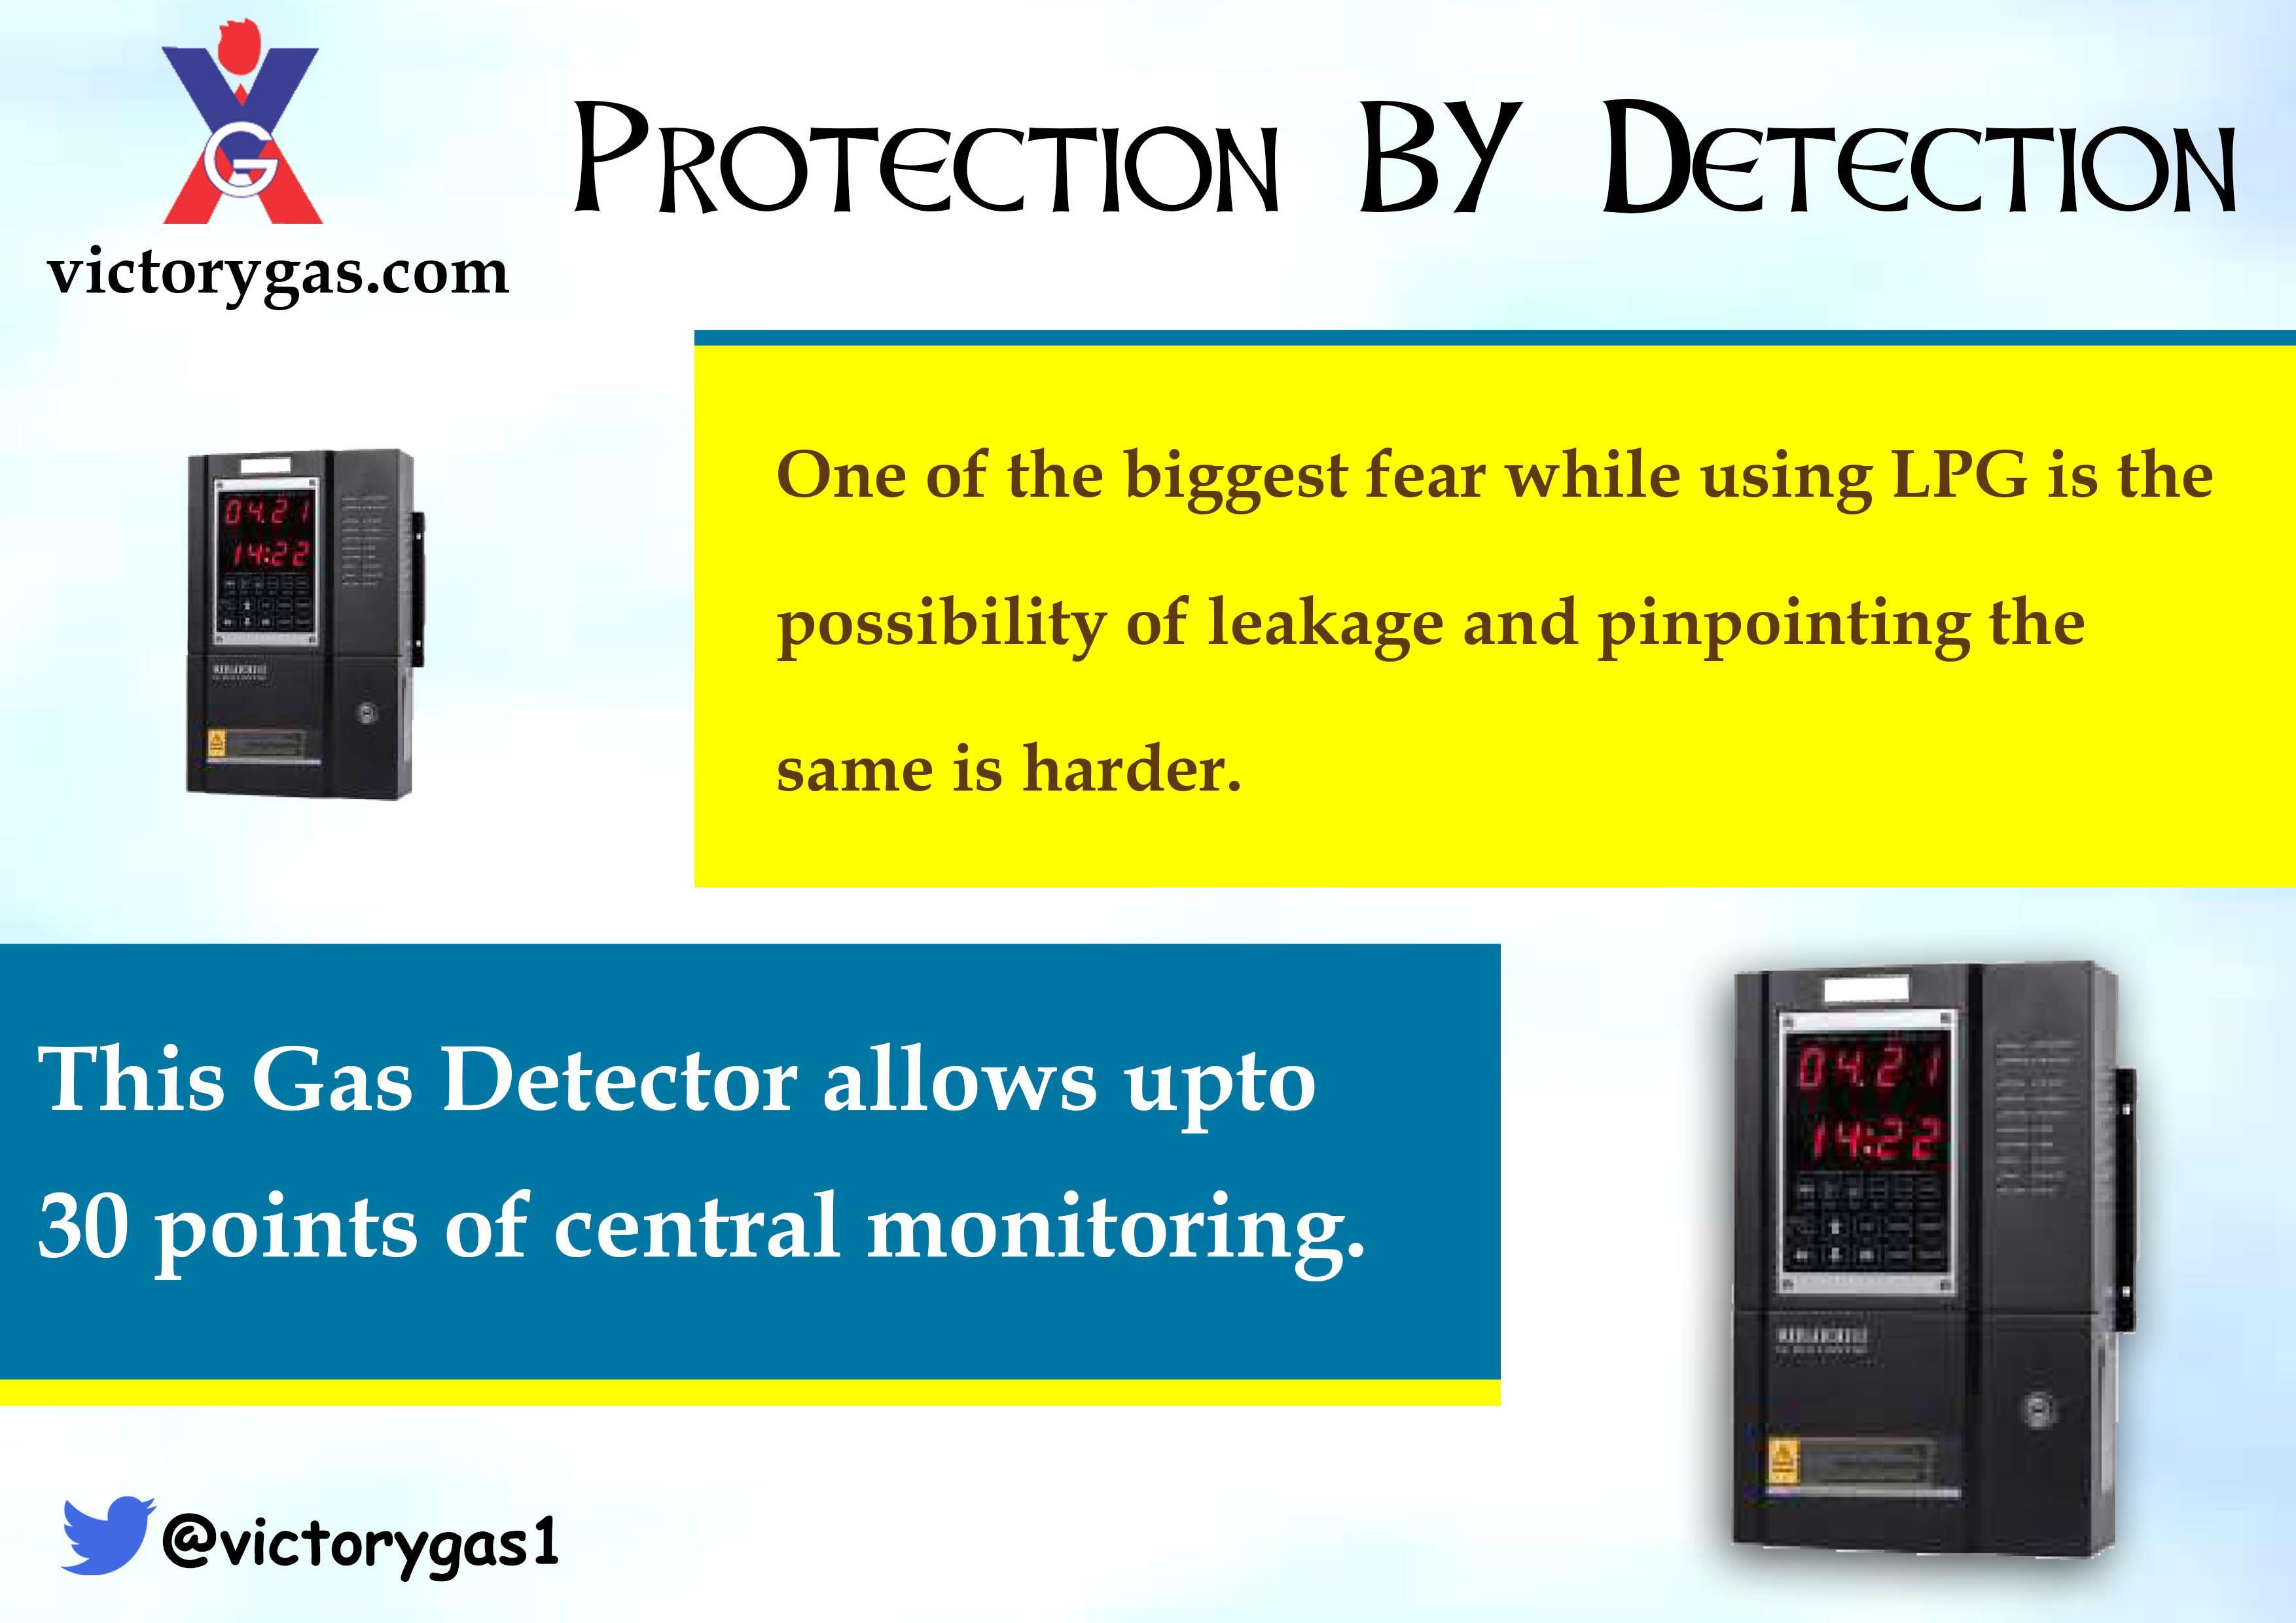 Gas Detectors Makes It Easier To Detect Gas Leakage Gasleakage Takeprecaution Gas Detector Alarm Companies